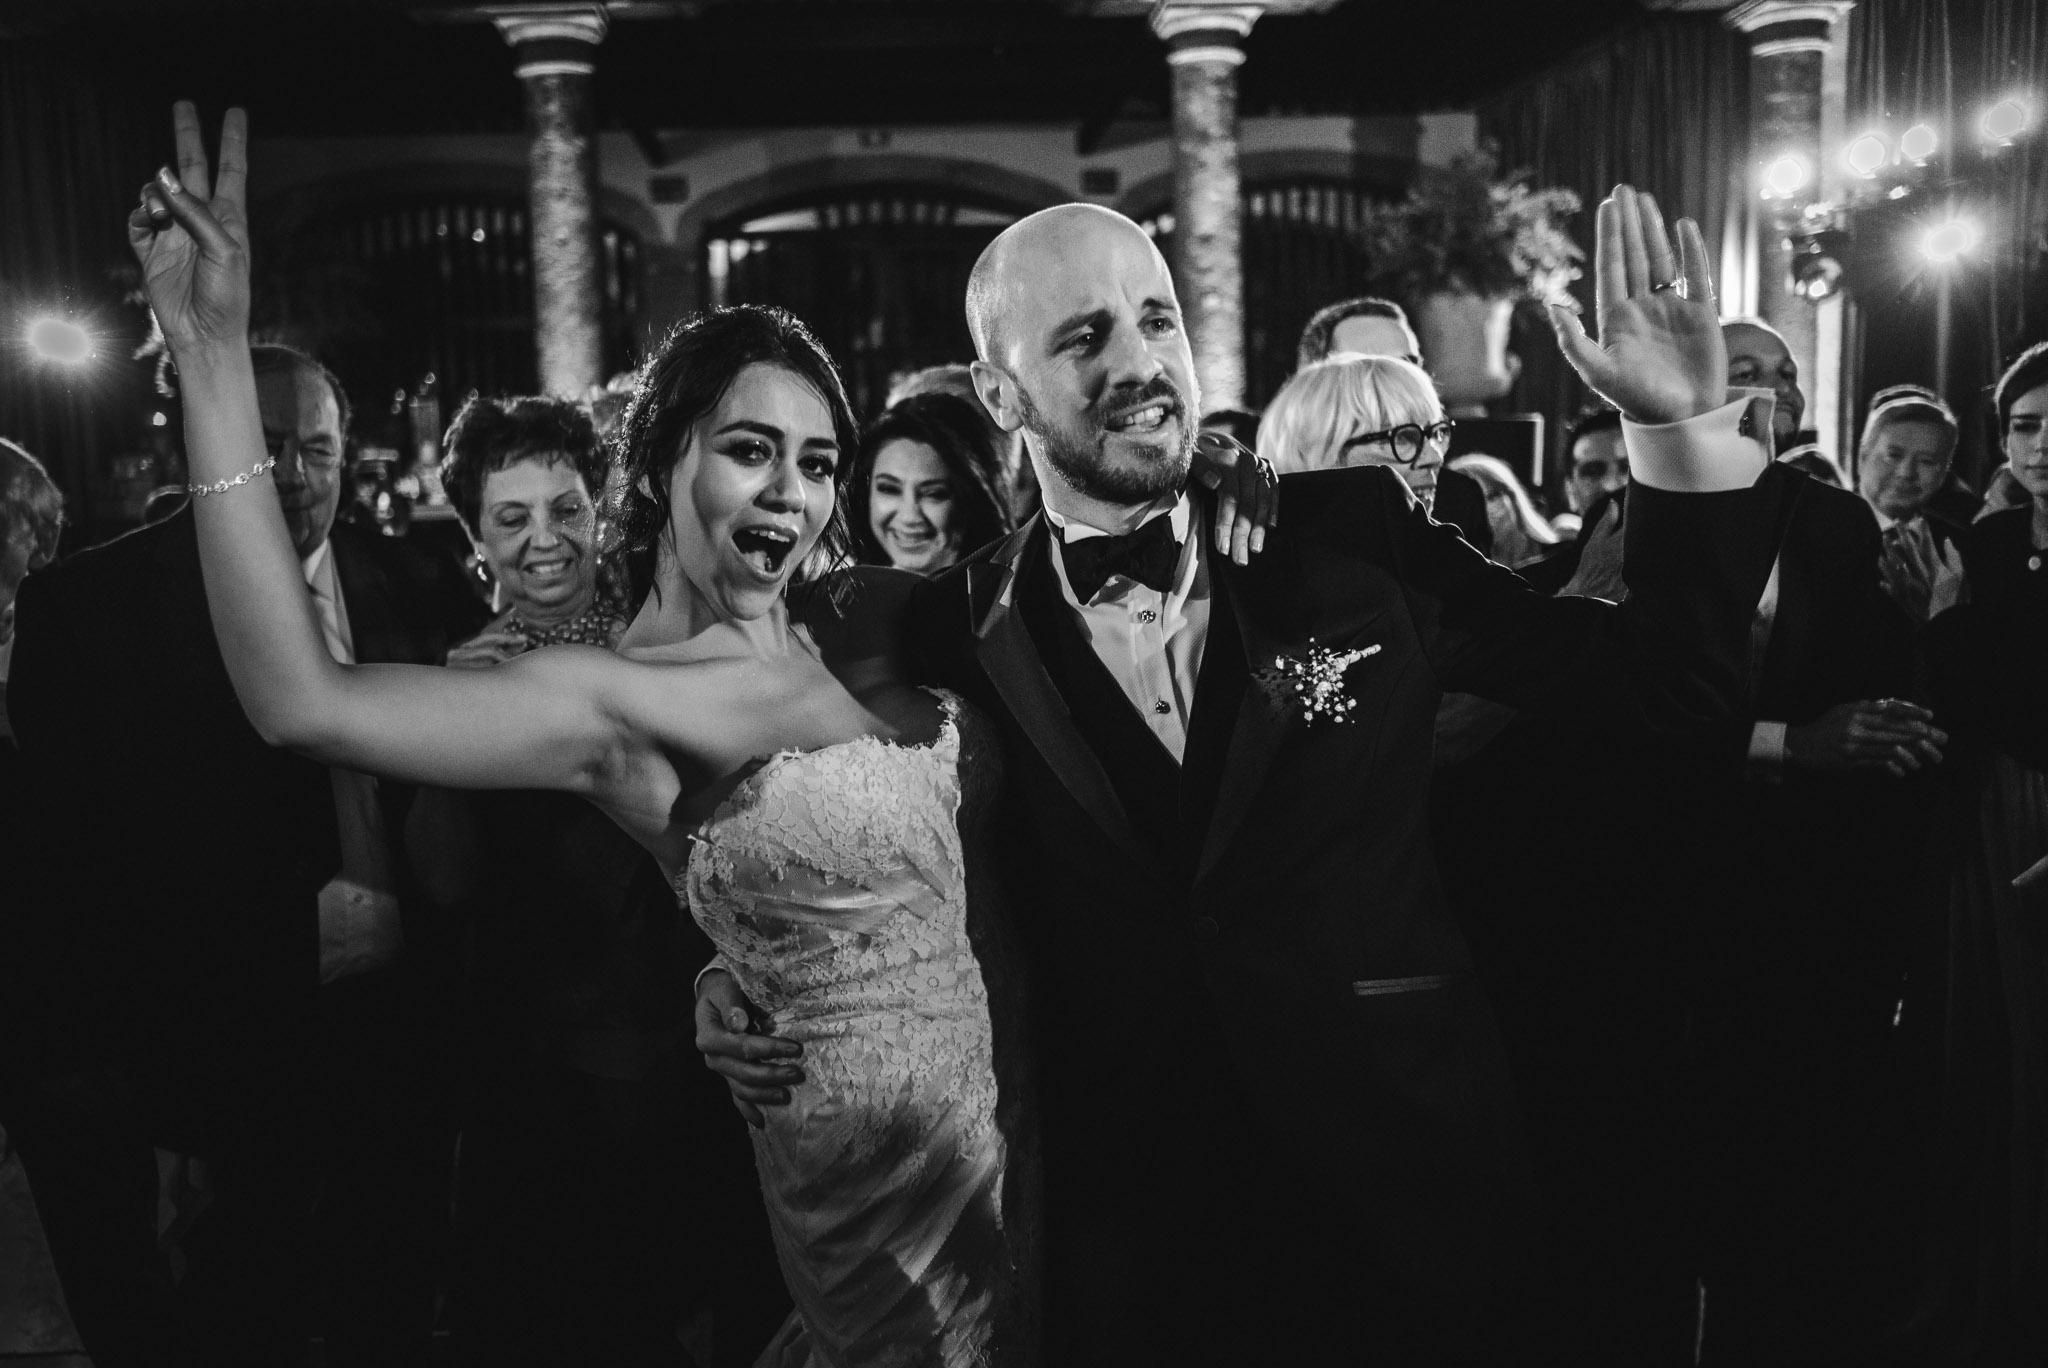 ©www.mauriziosolisbroca.com-20161002maurizio-solis-broca-mexico-canada-wedding-photographer20161002DSC05633-Edit.jpg